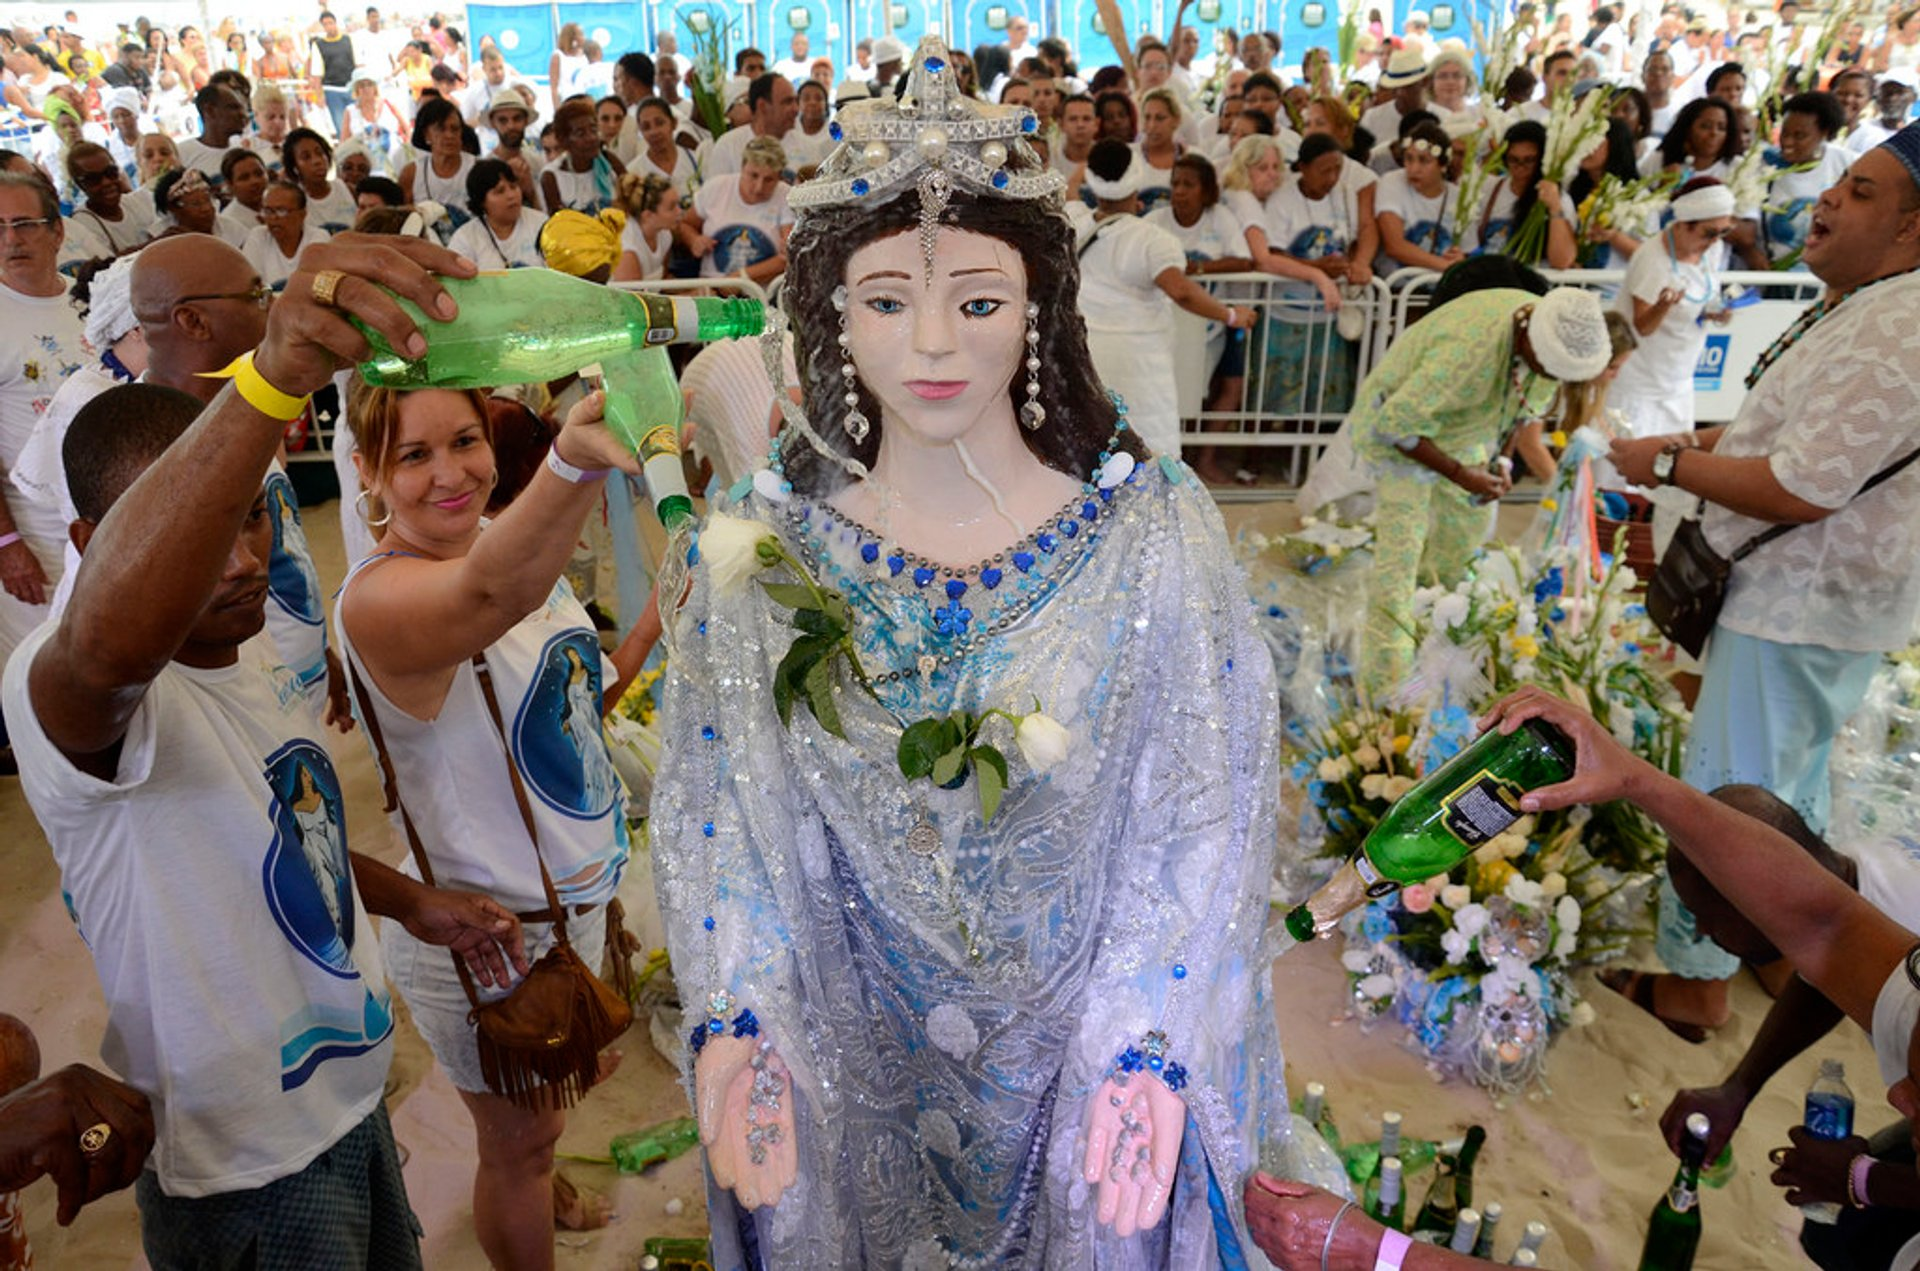 Festa da Iemanjá in Rio de Janeiro - Best Season 2019